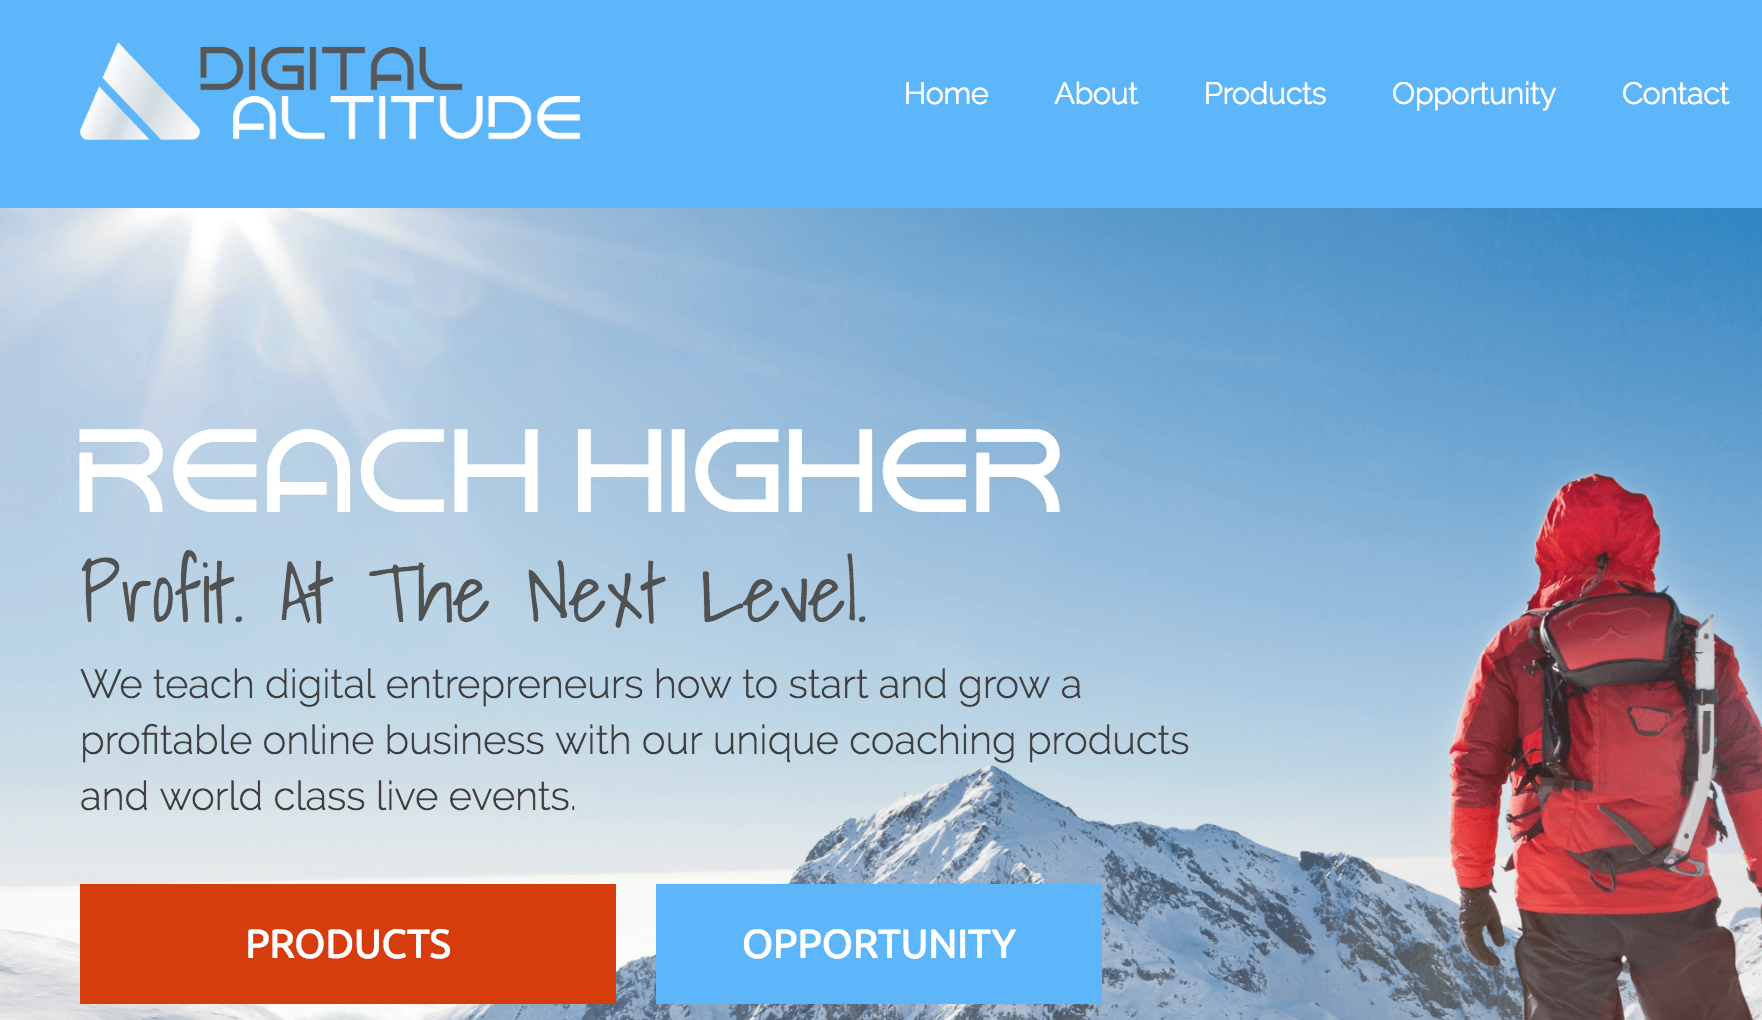 digital-altitude-website